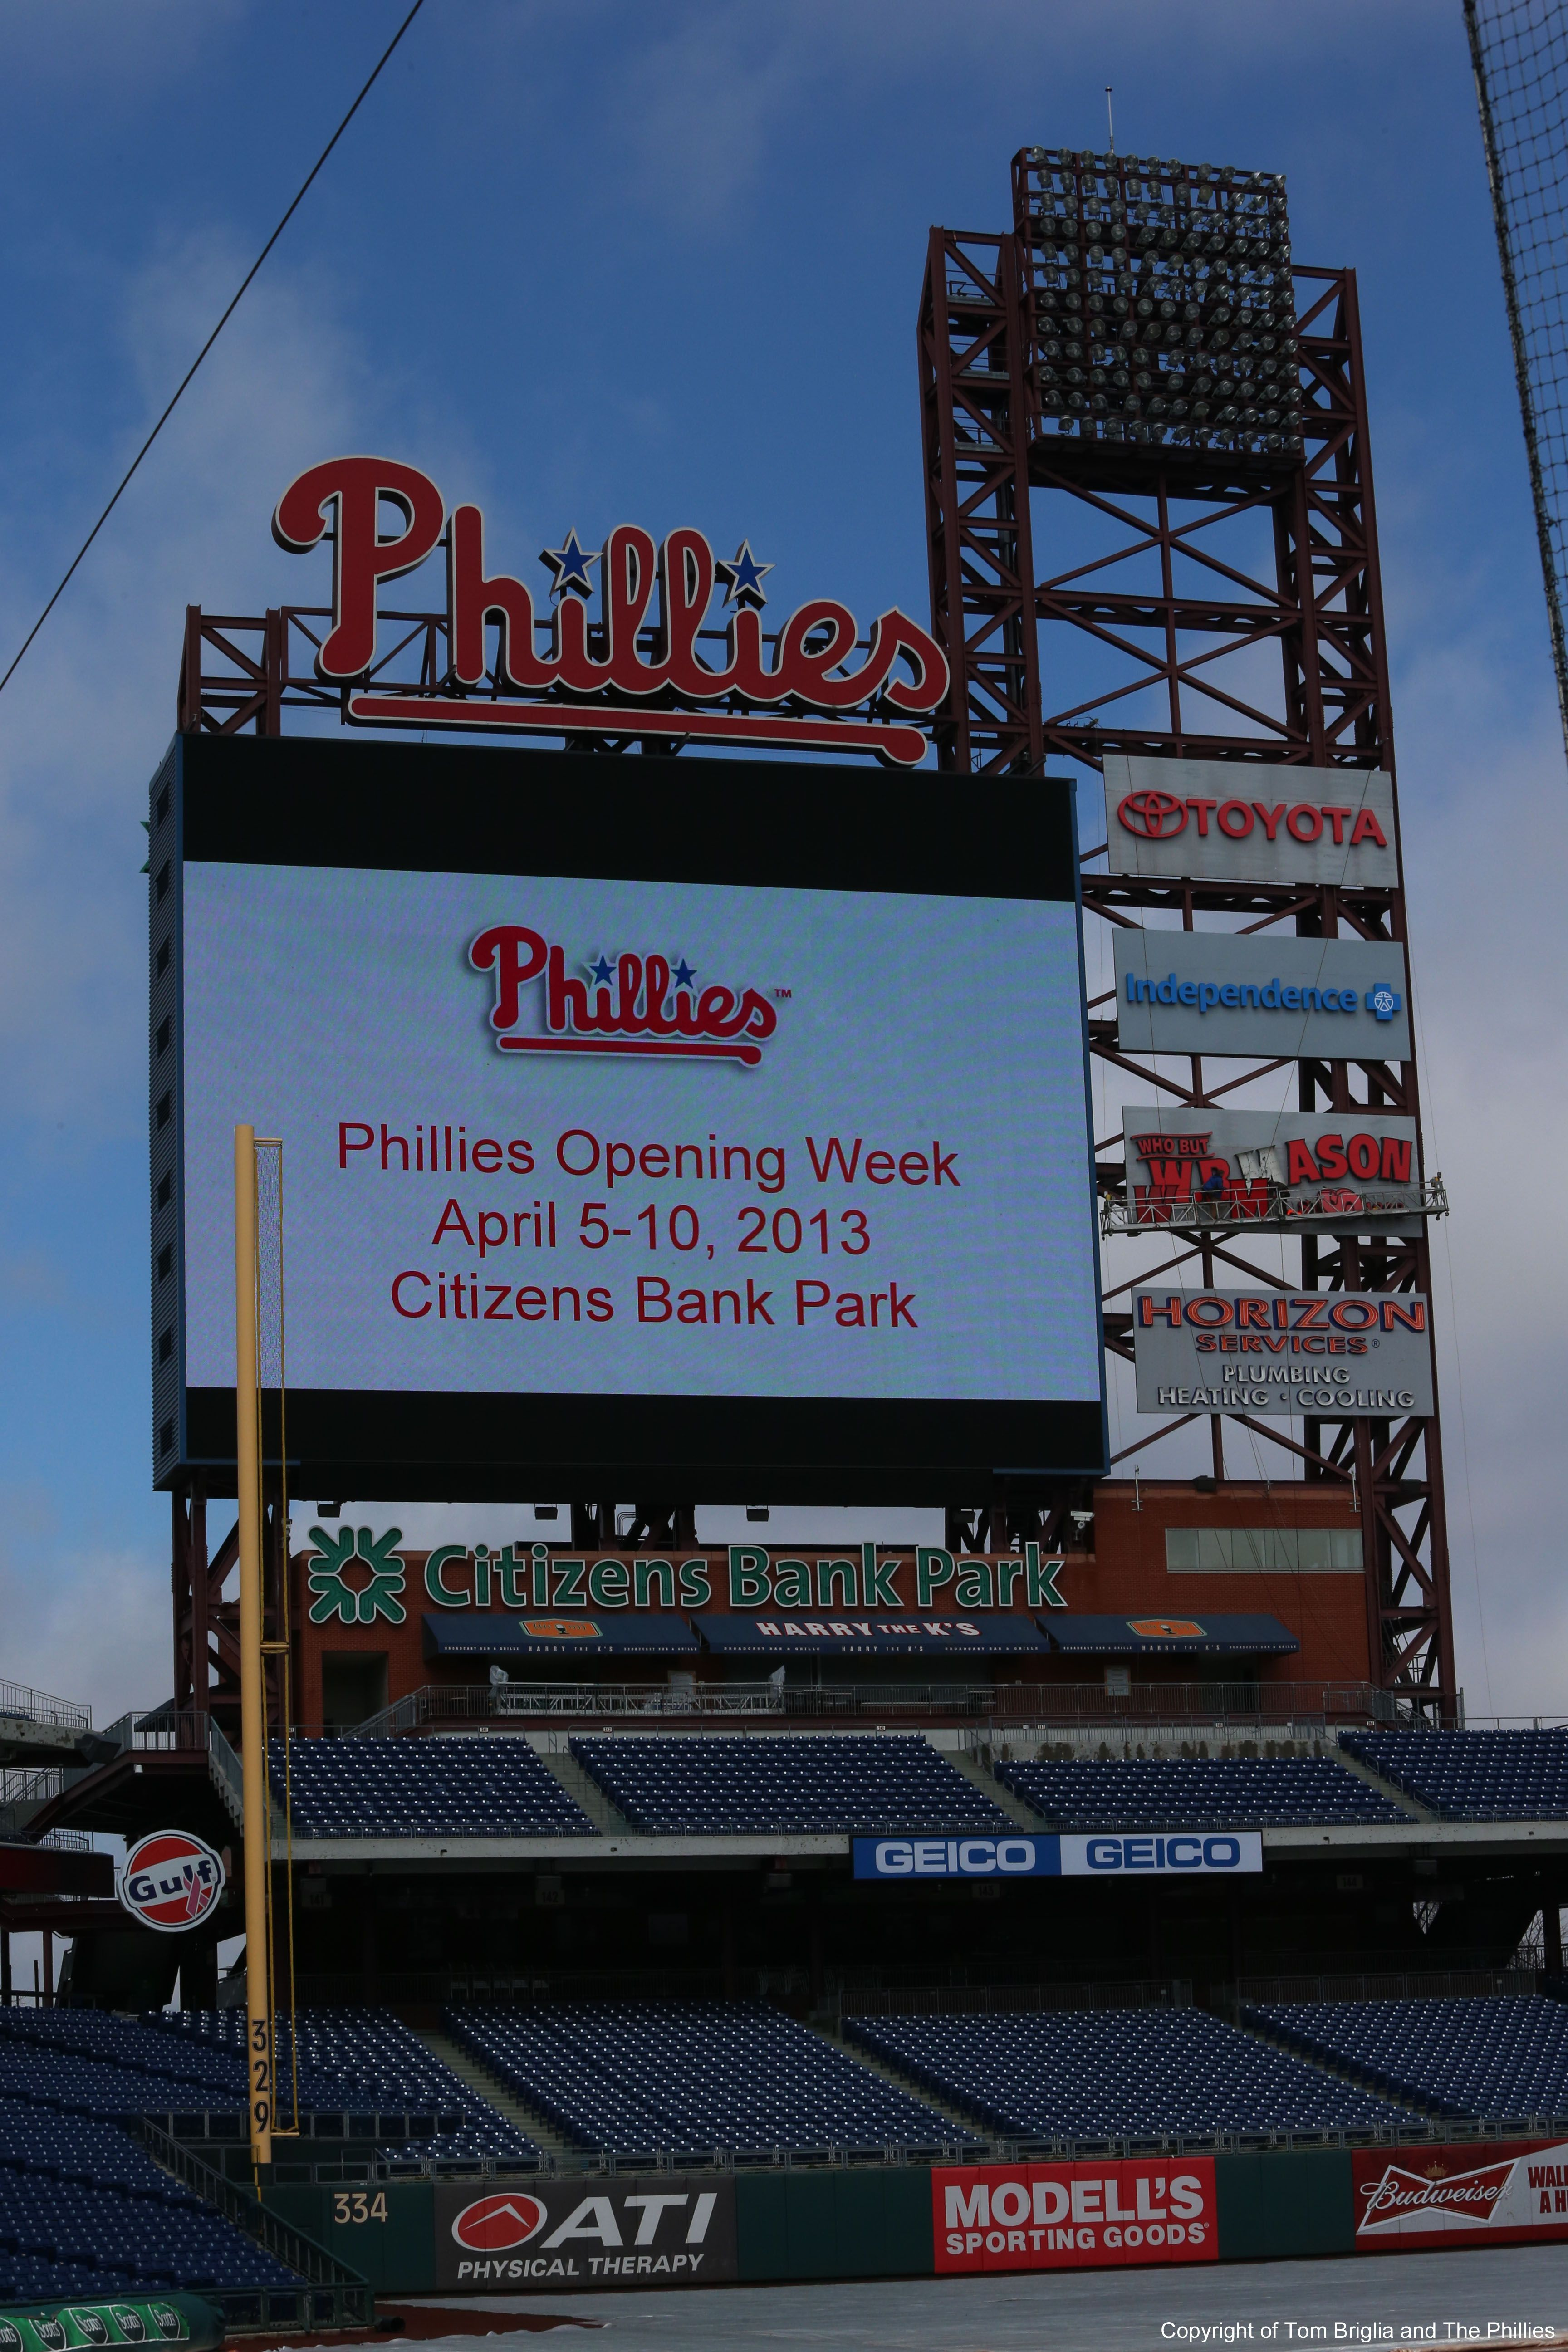 What S Hot This Season At Citizens Bank Park Home Of The Phillies Philadelphia Sports Philadelphia Phillies Citizen